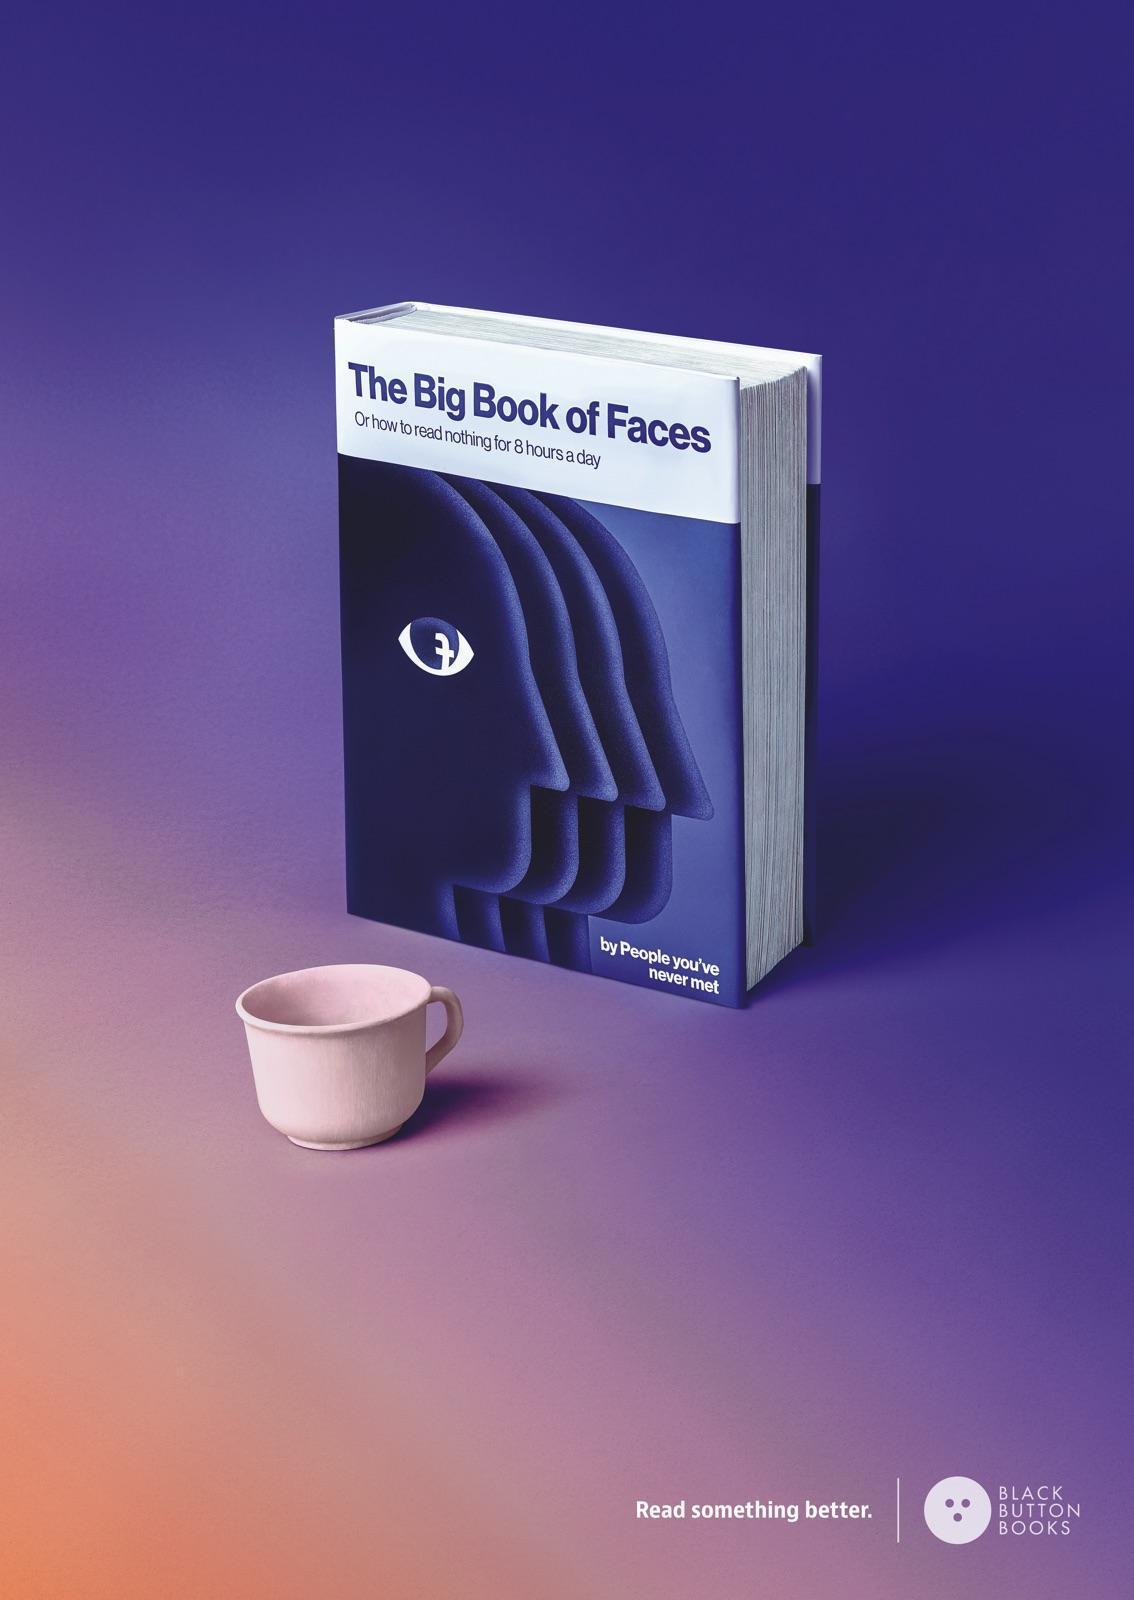 black_button_books_-_big_book_of_faces_thumb